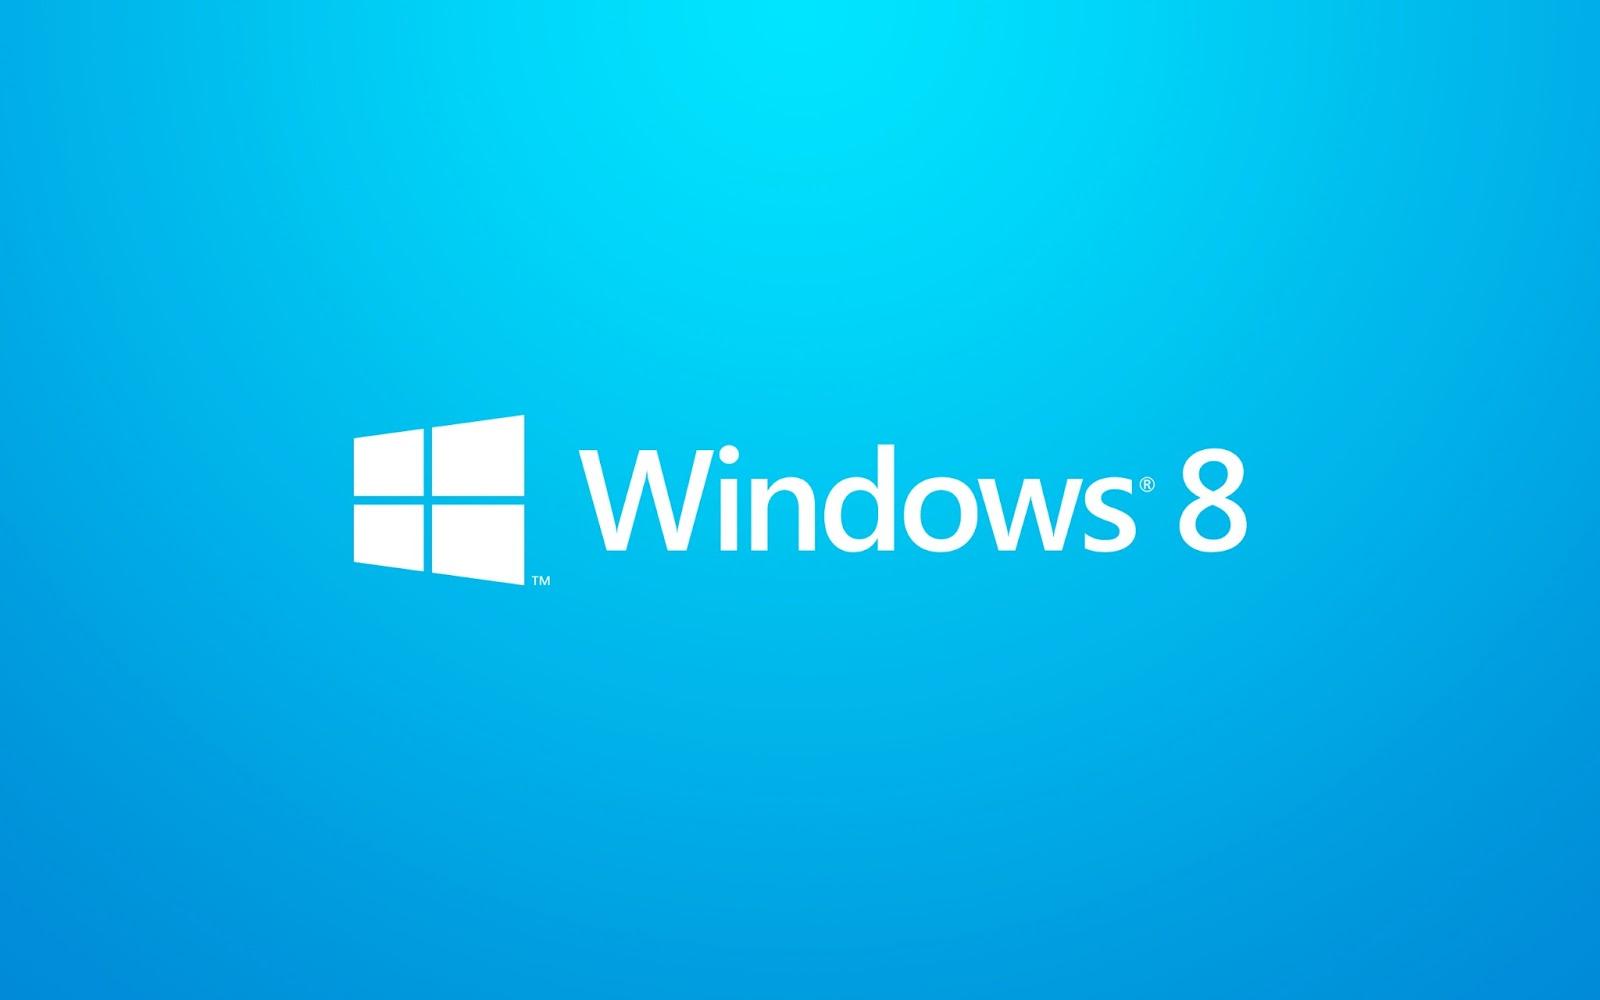 Windows 8 Wallpapers Release: Windows 8 Wallpaper Set 7